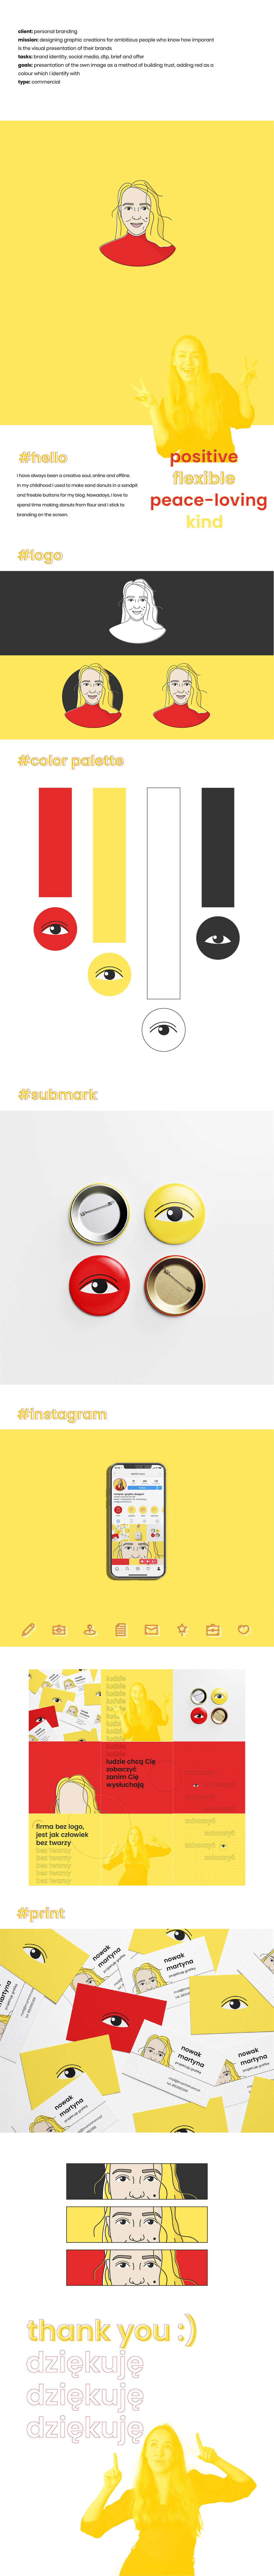 brand identity Personal Identity buisness card logo social media submark